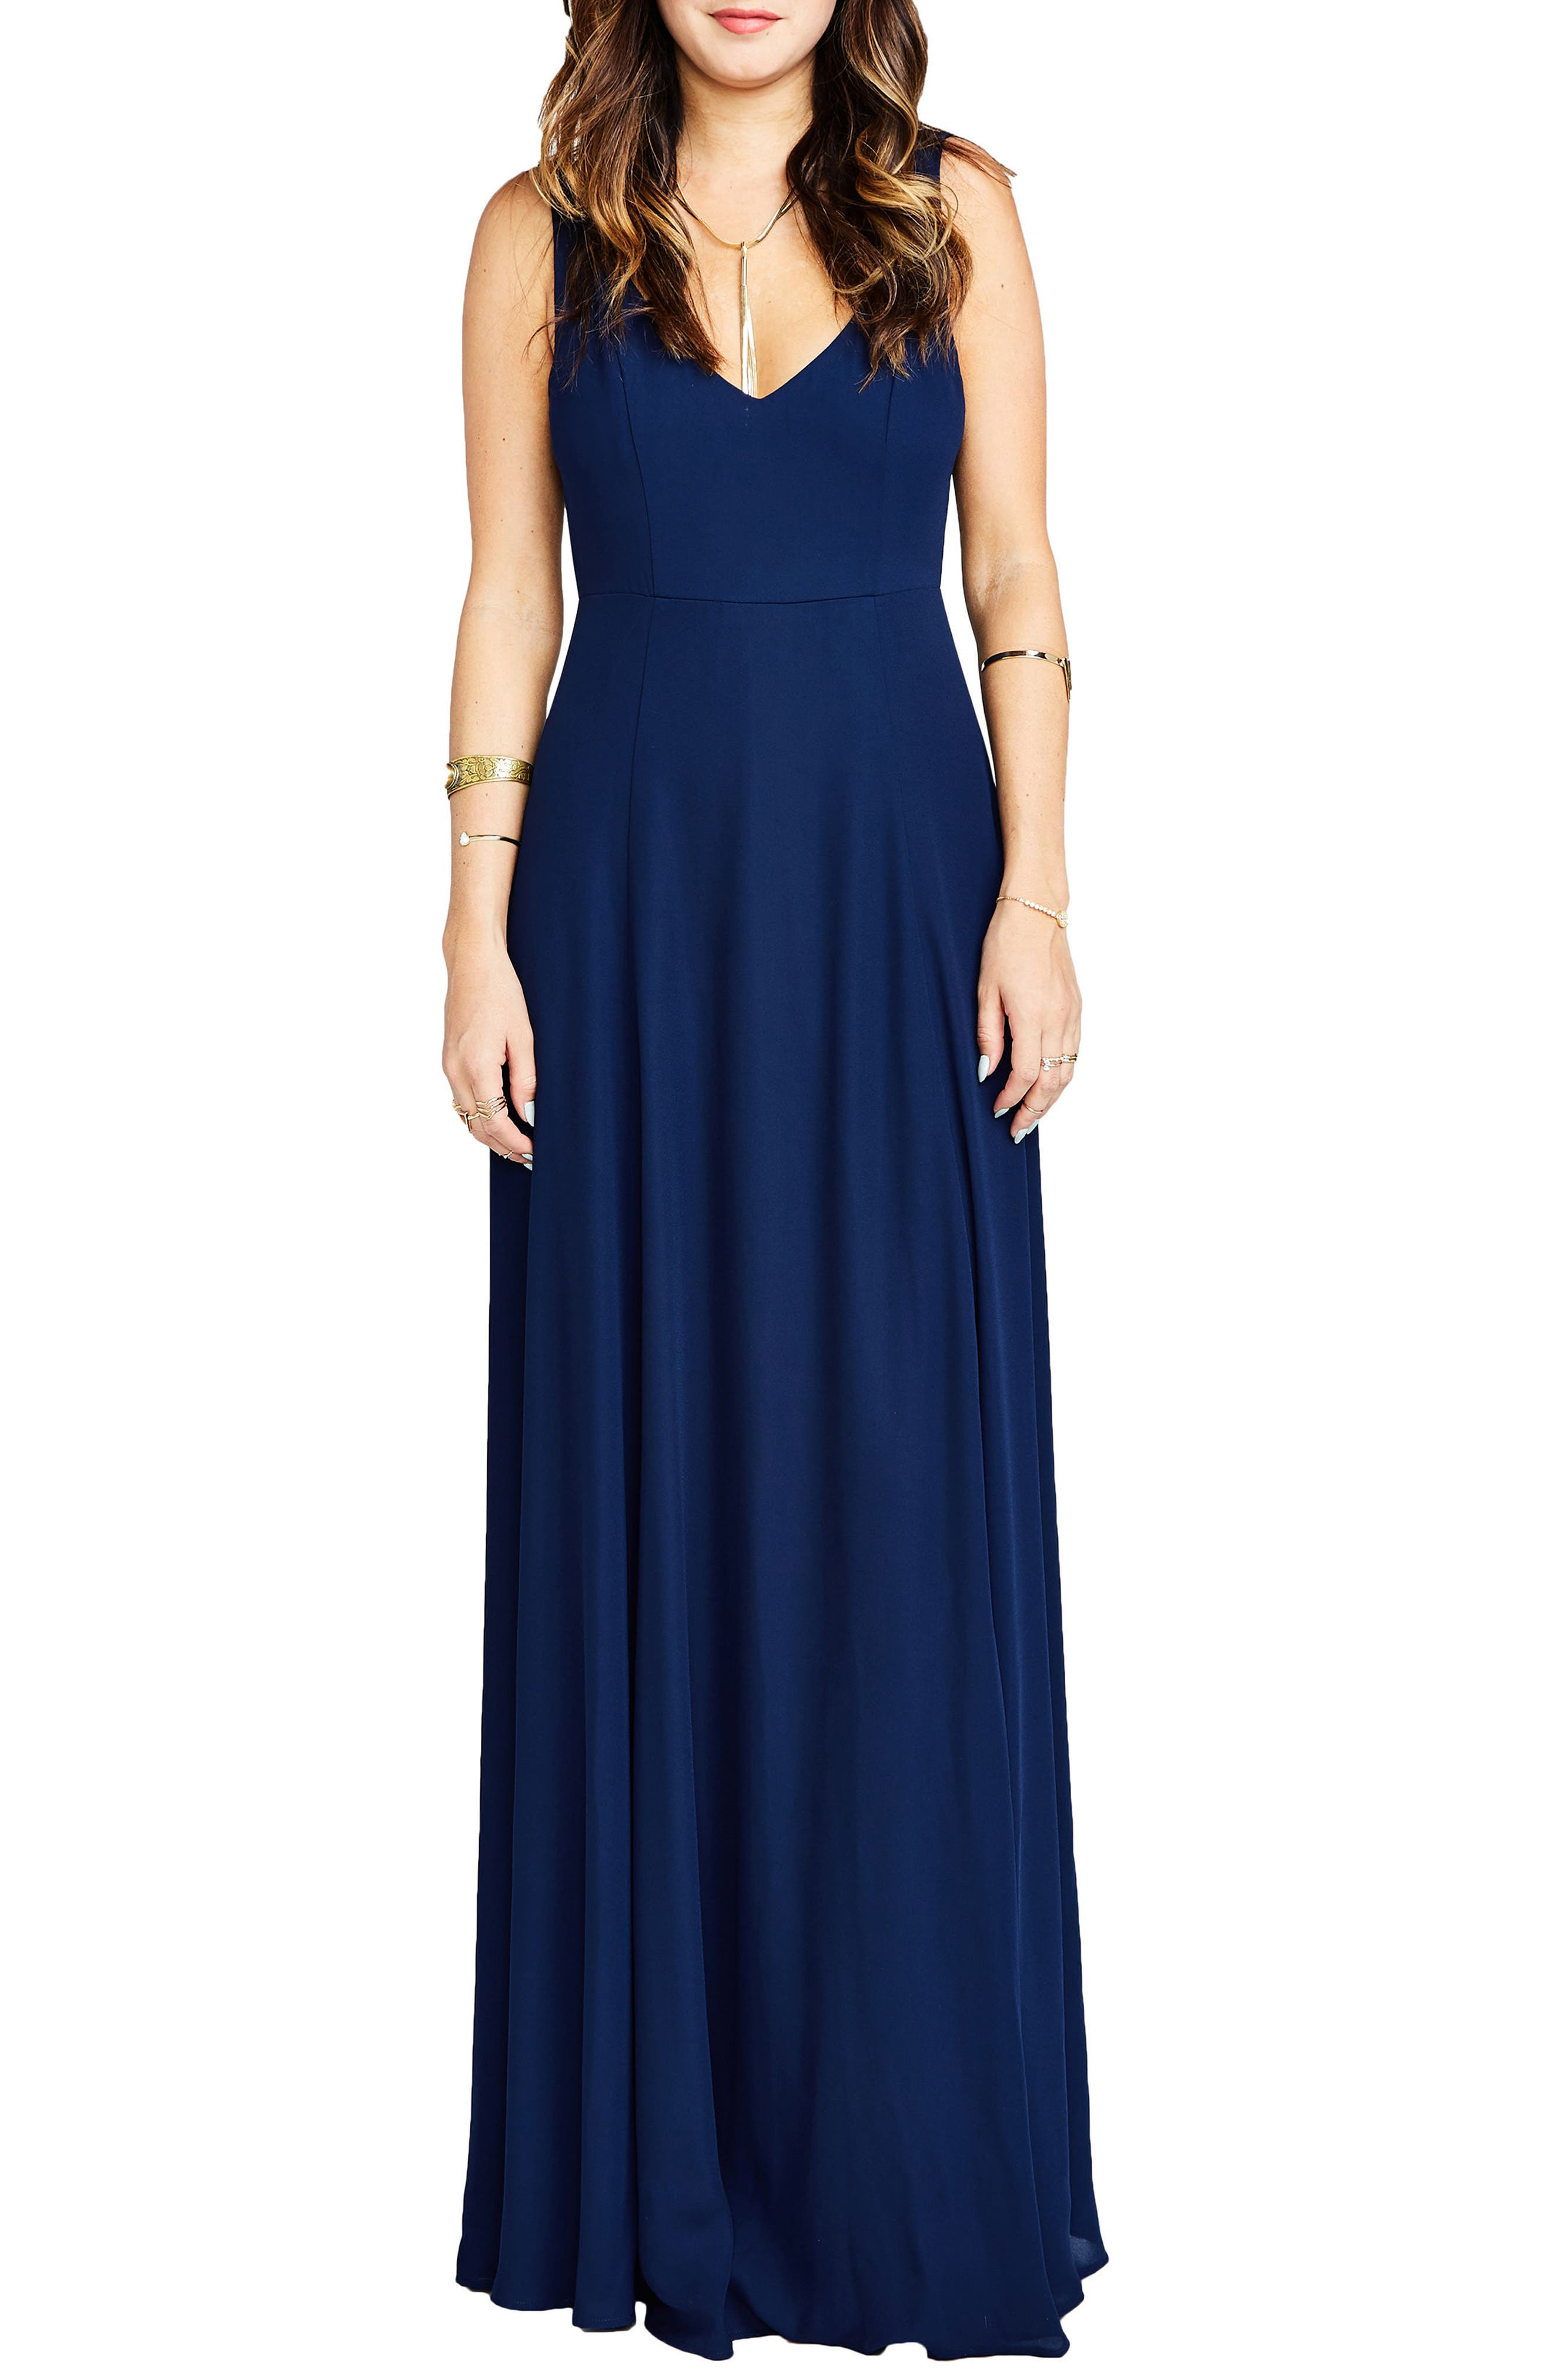 Alternate Image 1 Selected - Show Me Your Mumu Jen Maxi Gown